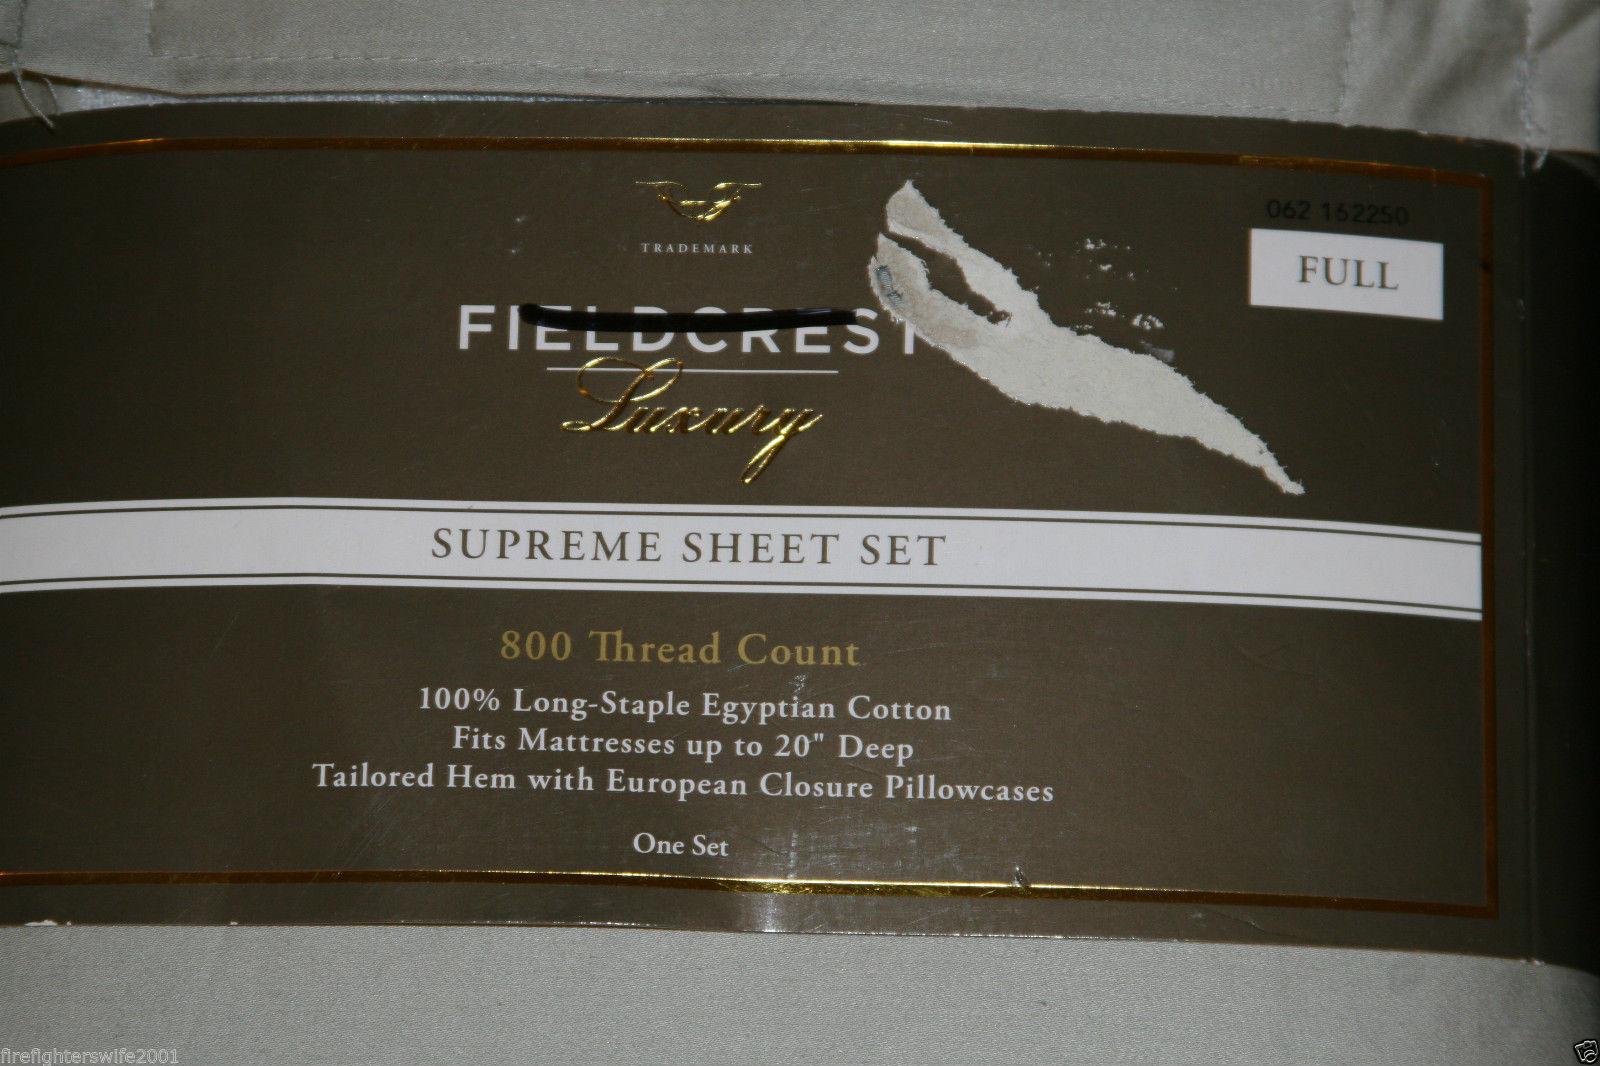 Fieldcrest 800 Thread Count Sheets | Fieldcrest Luxury Sheets | Field Crest Sheets